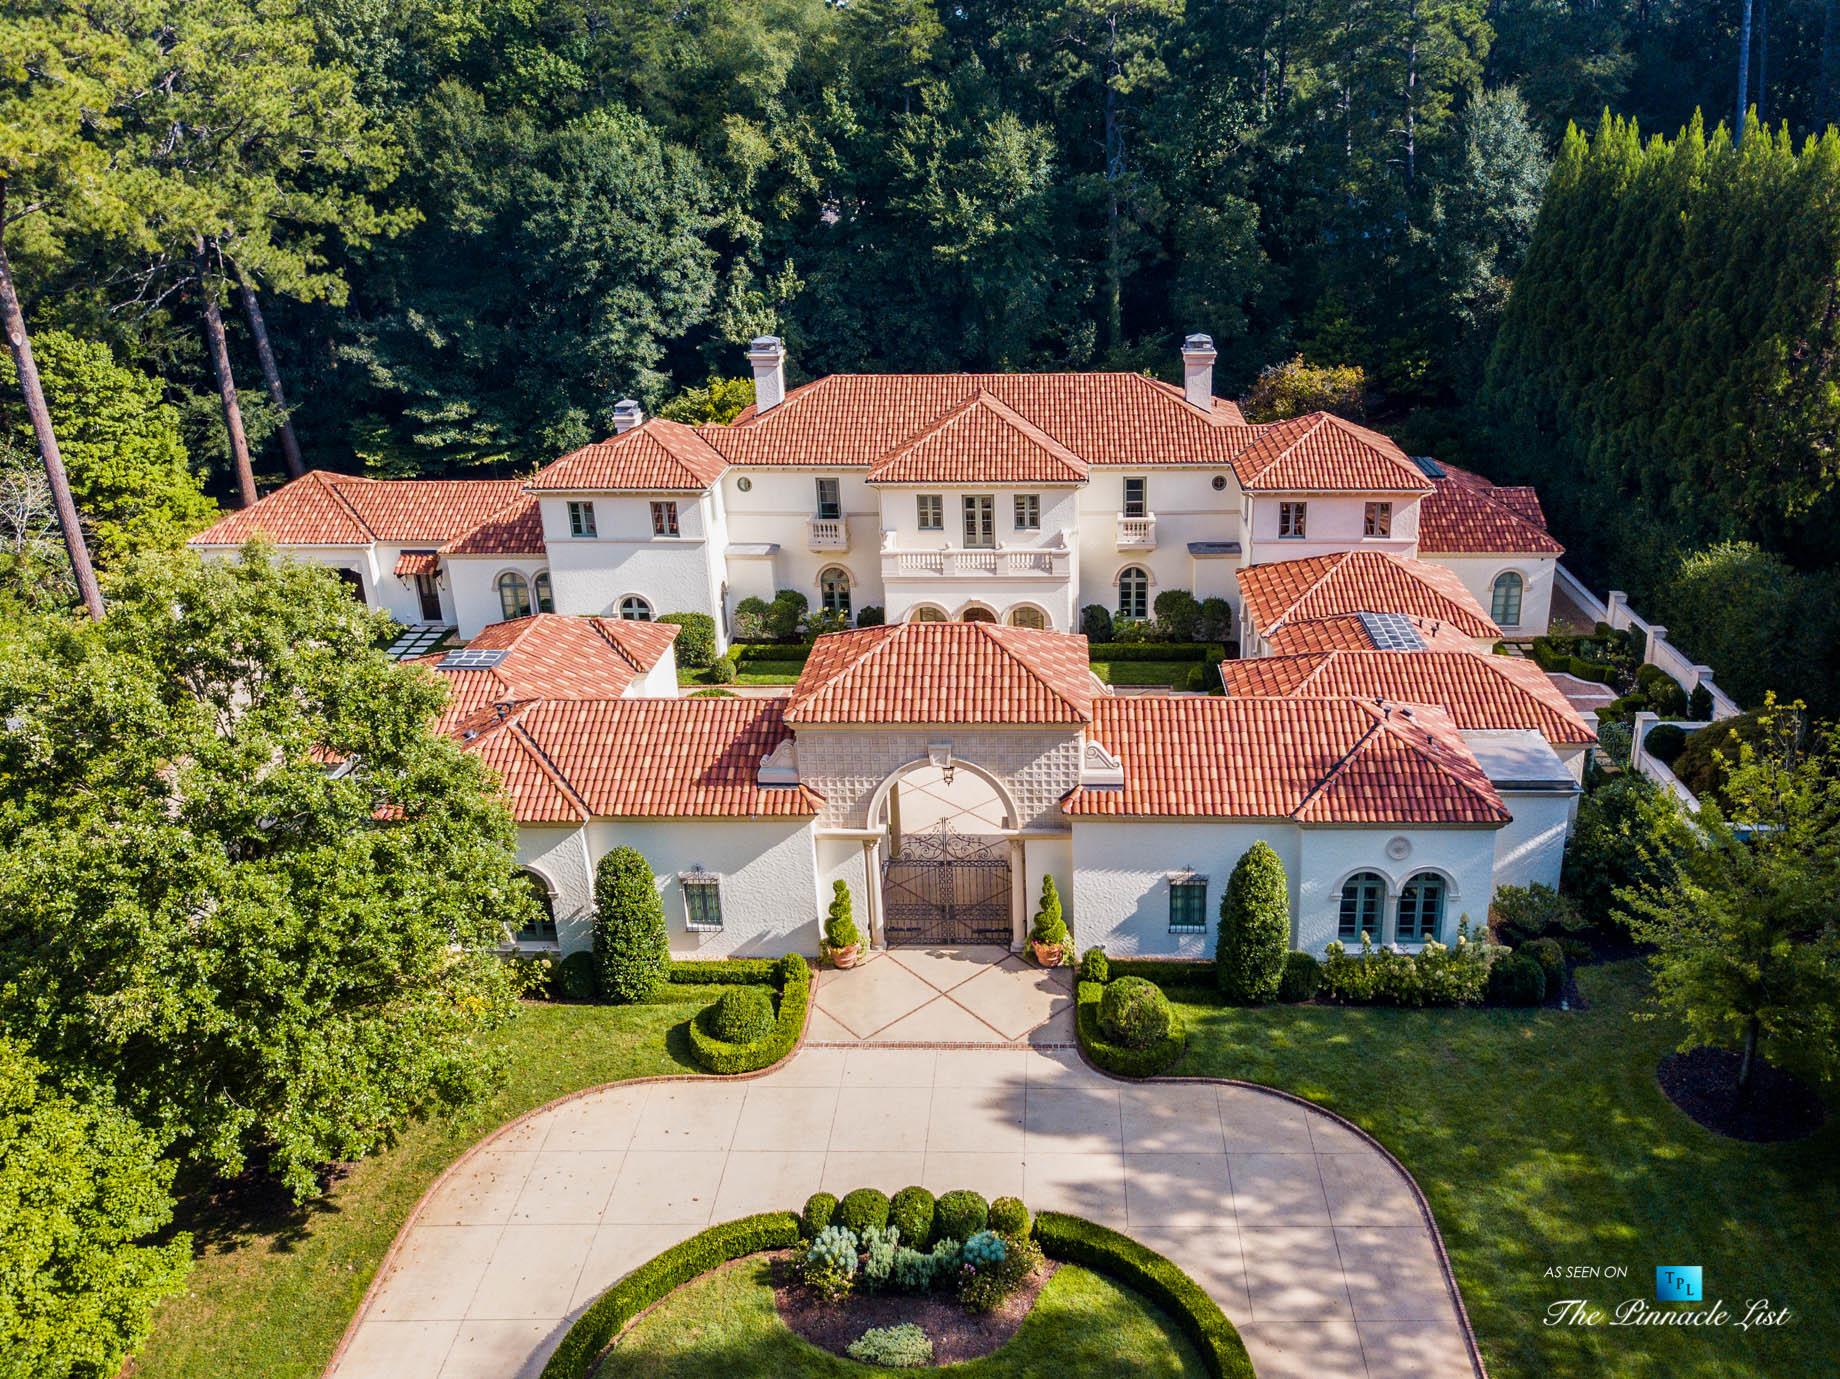 439 Blackland Rd NW, Atlanta, GA, USA - Luxury Real Estate - Berndsen Custom Mansion Home